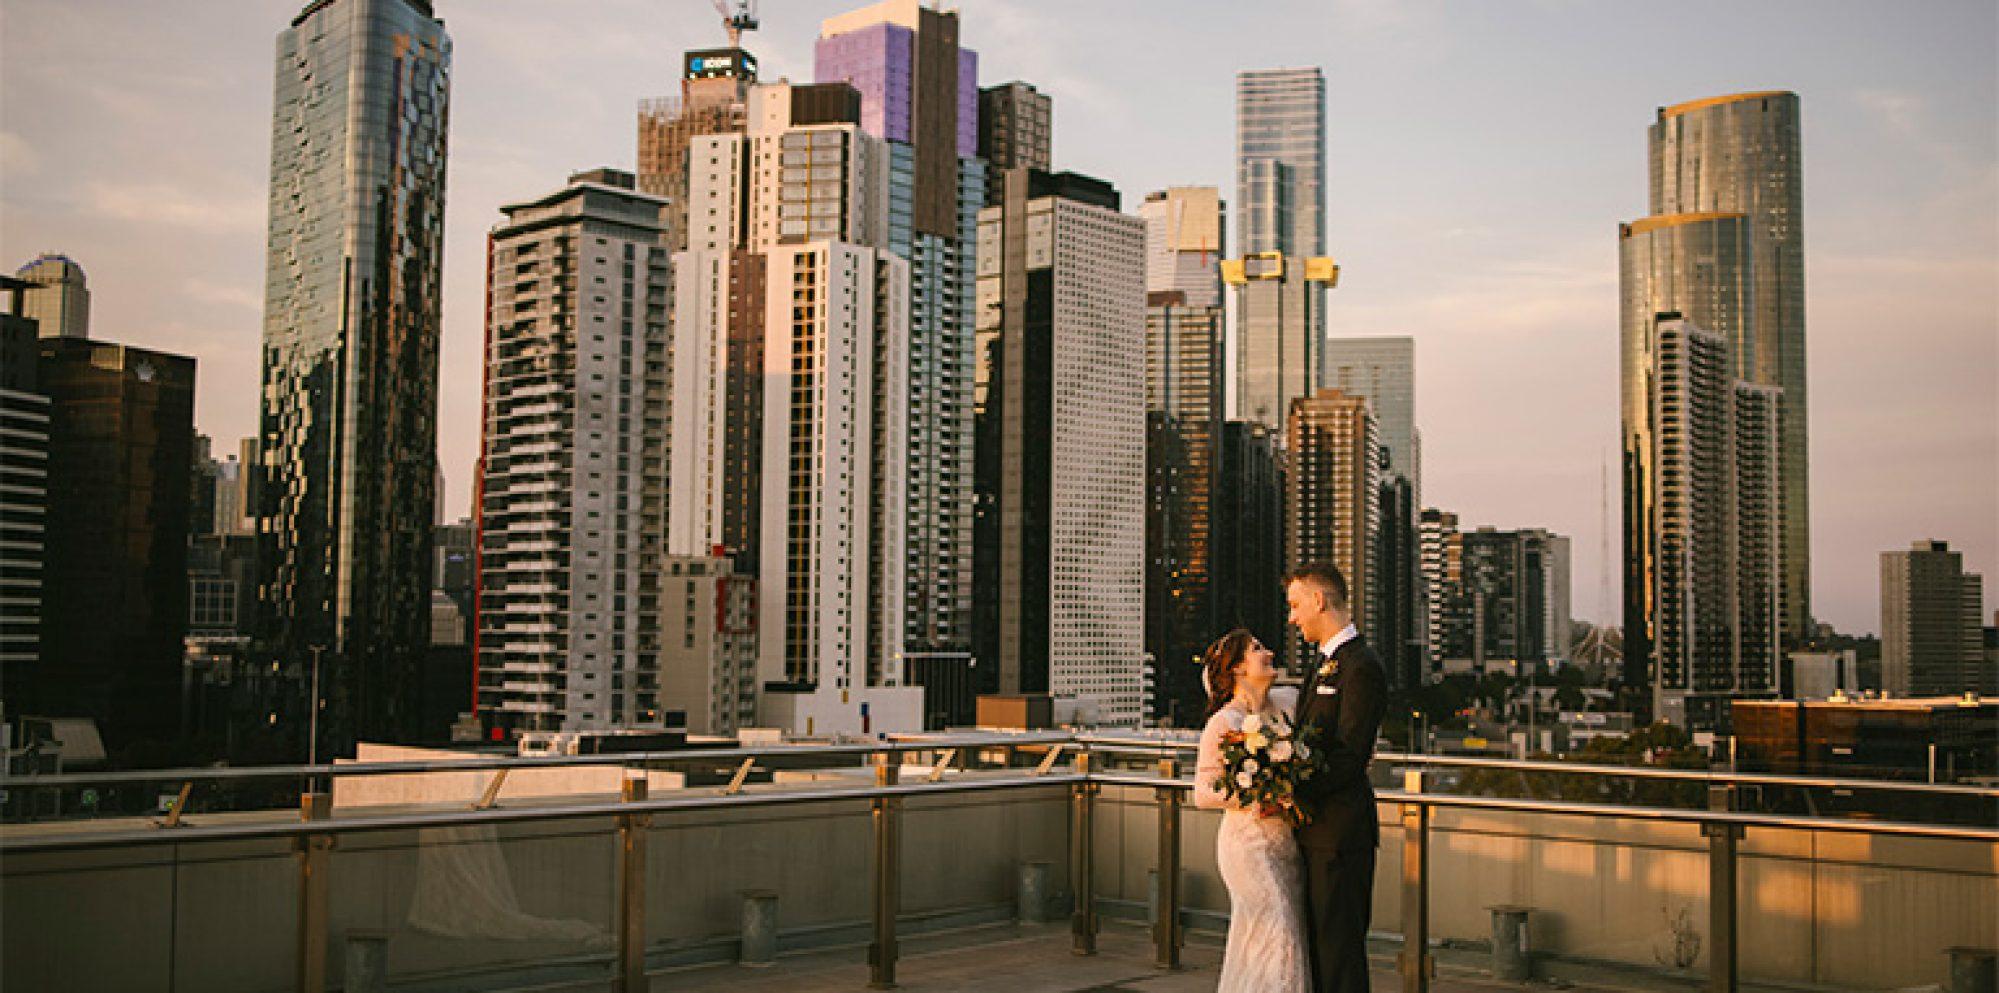 Lauren & nathan wedding photography @ luminare